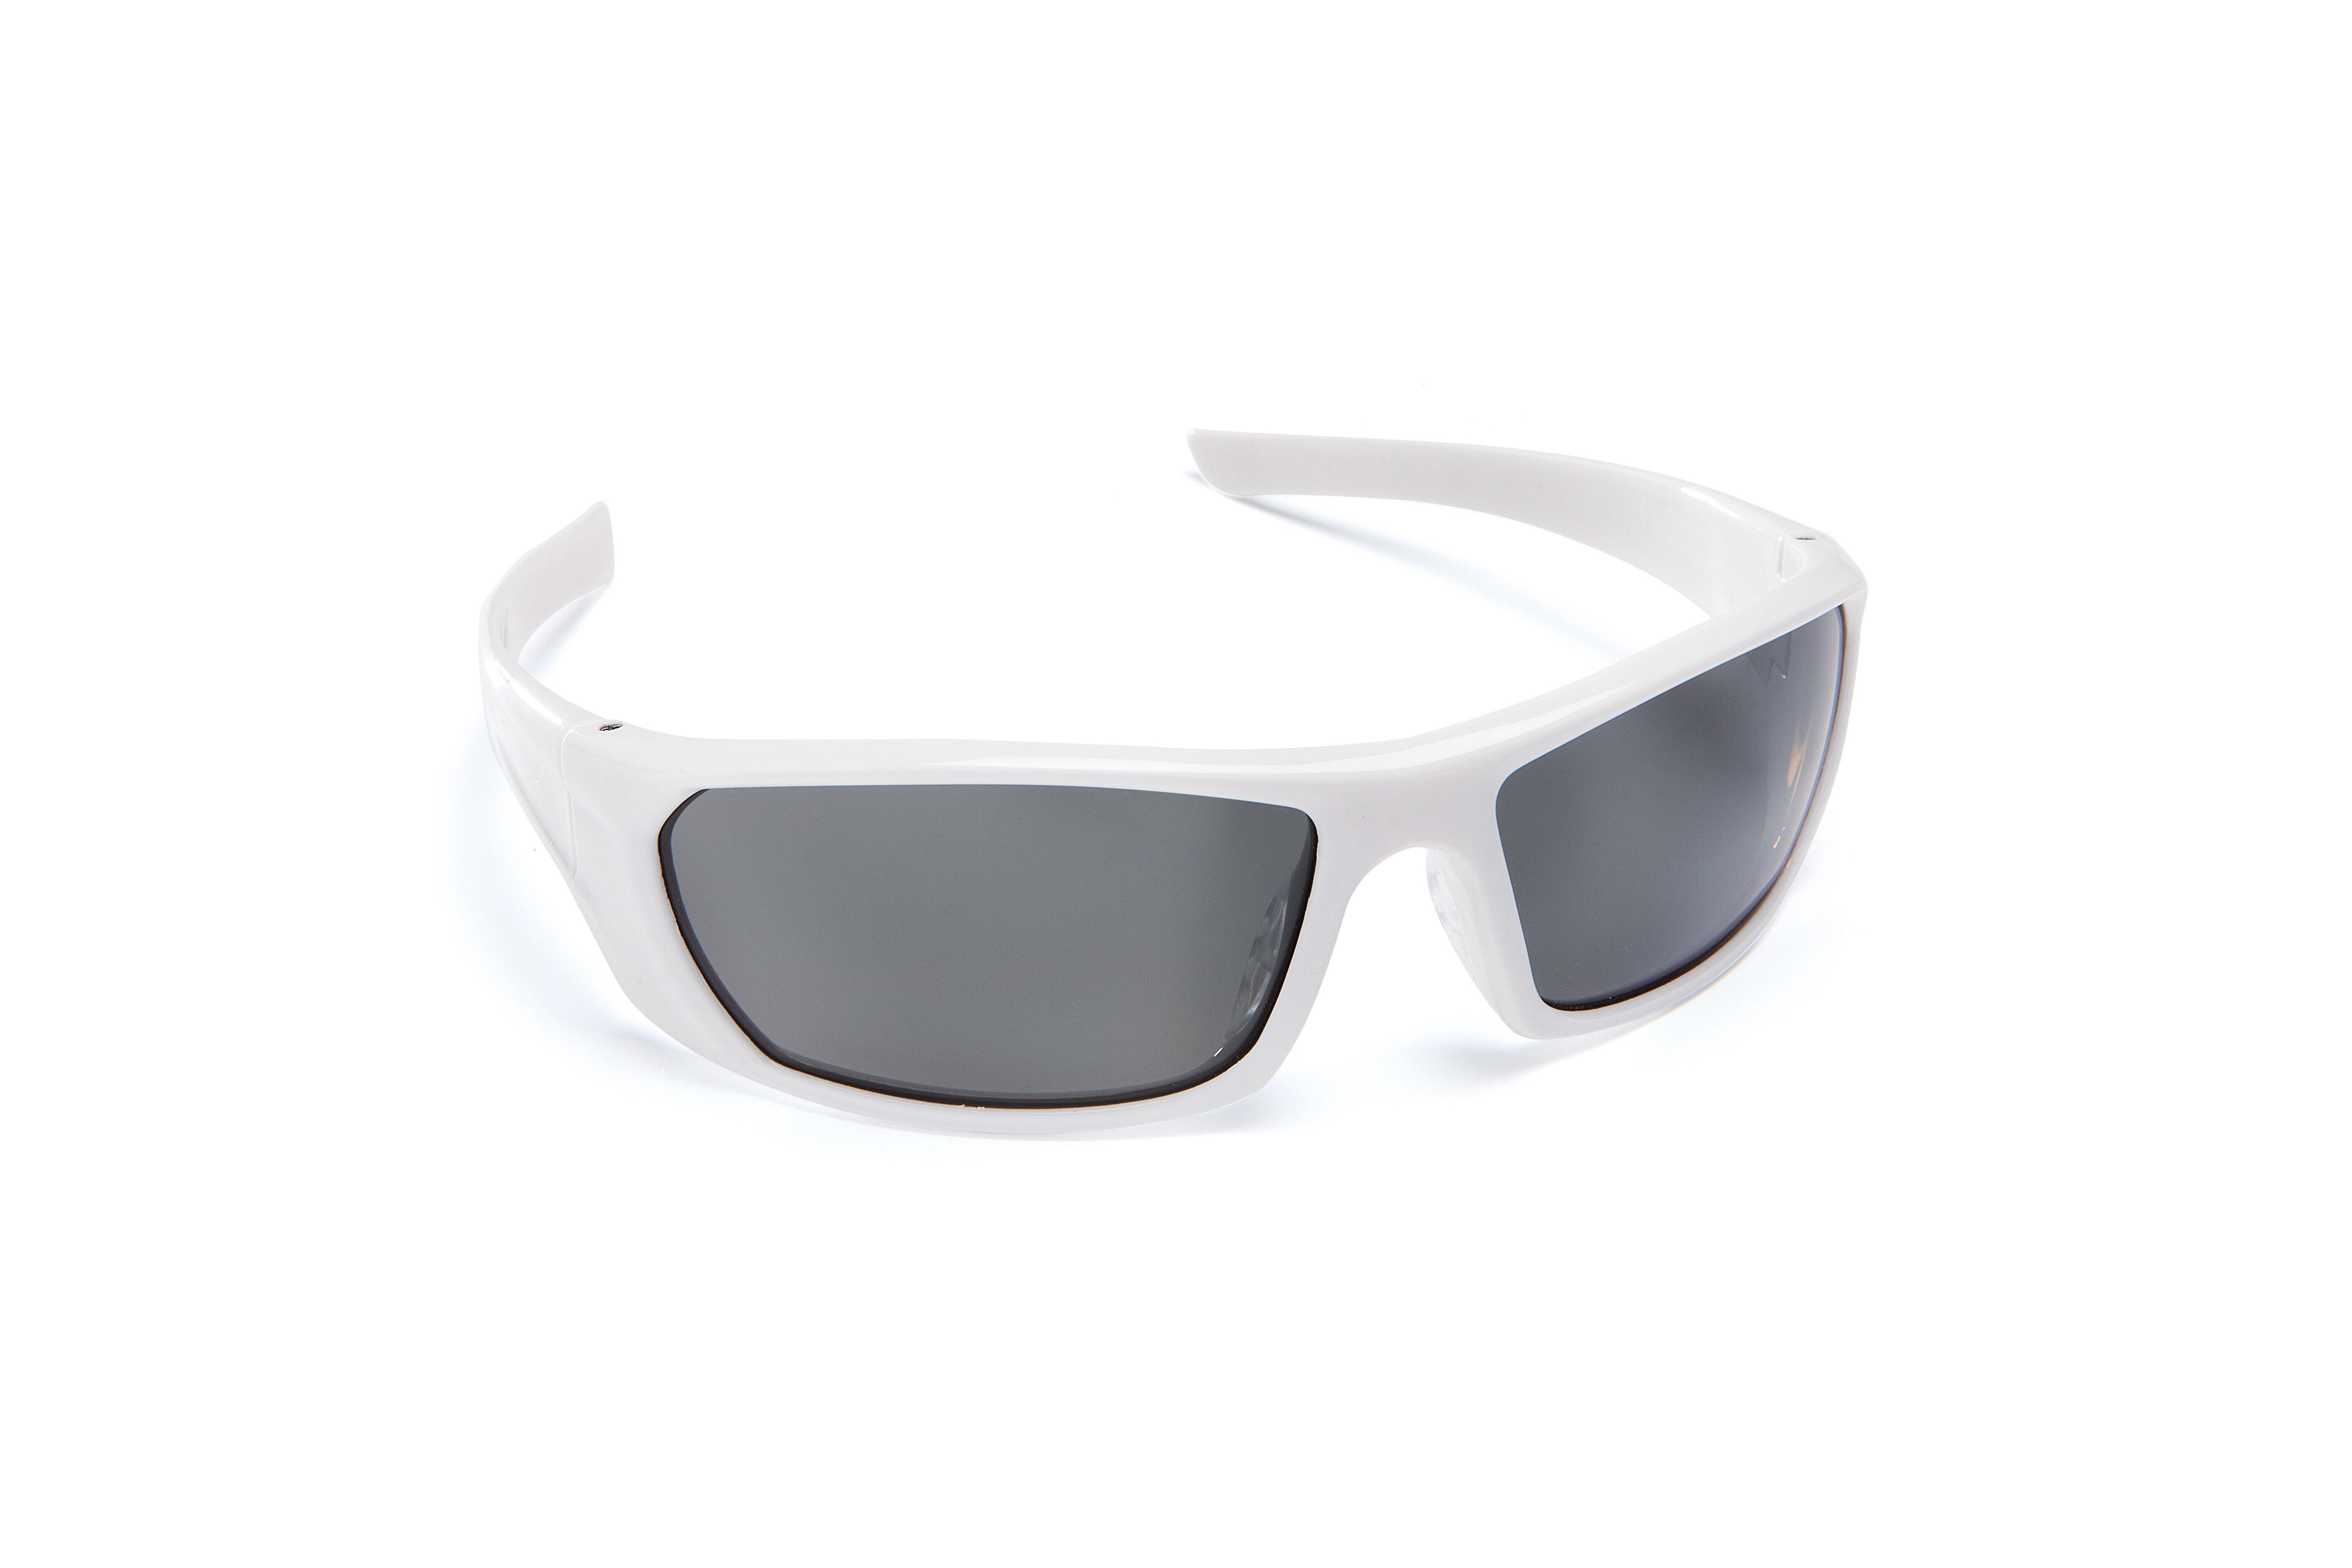 Force360 Mirage Smoke Polarised Lens Spectacles White Frame (EFPR901) 00099